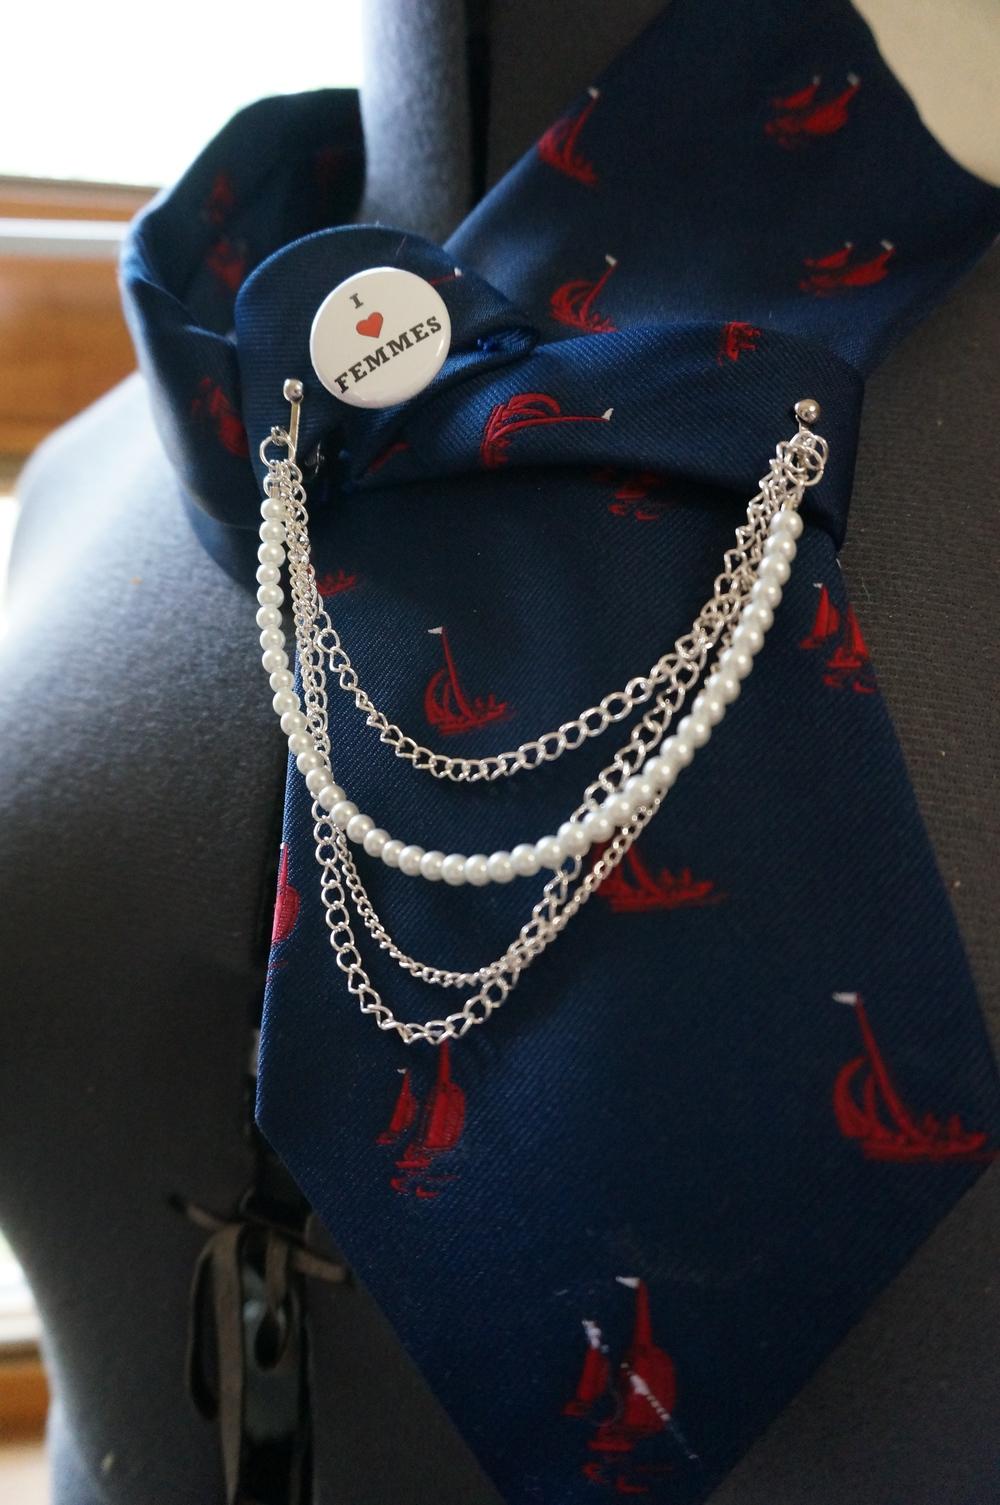 Baroness Sophia Designs art tie and chain Qwear